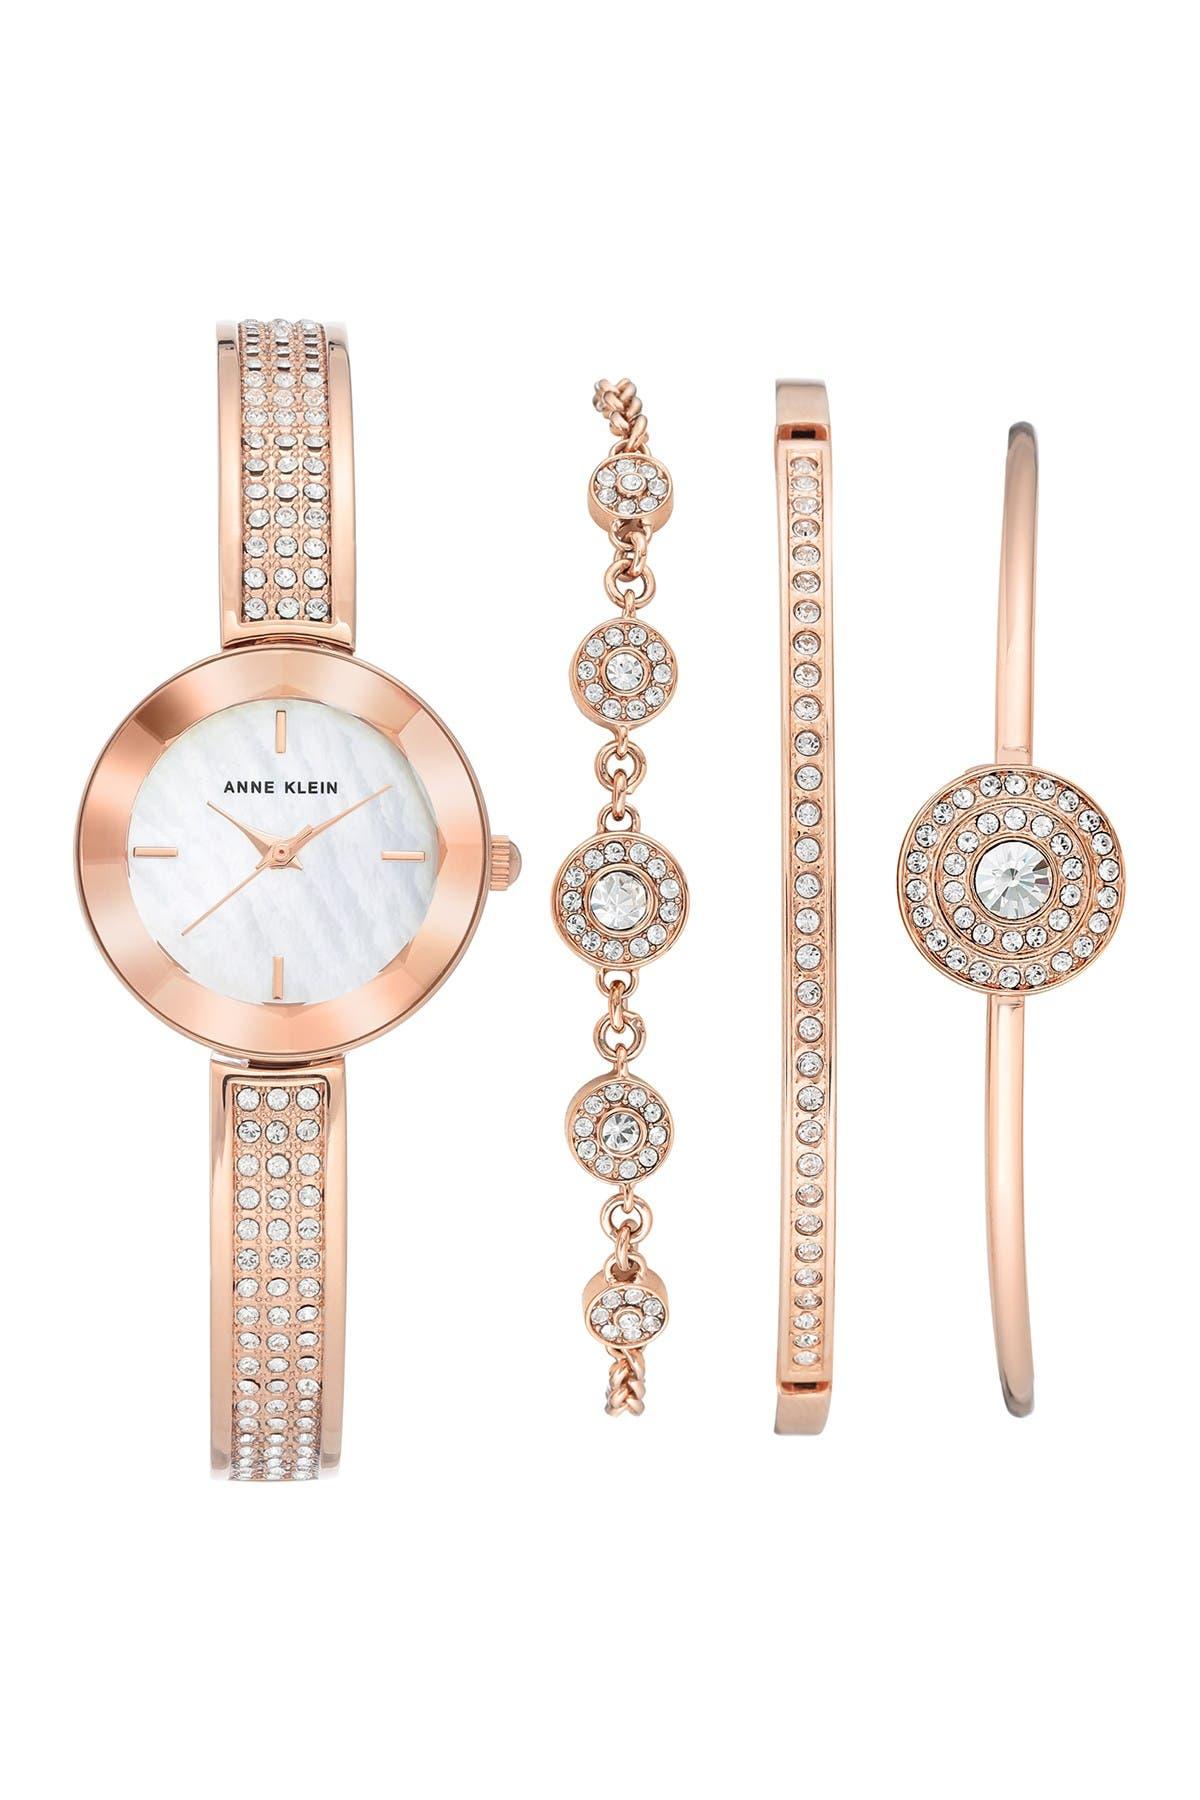 Image of Anne Klein Women's Crystal Bangle Watch & Bracelet Set, 26mm